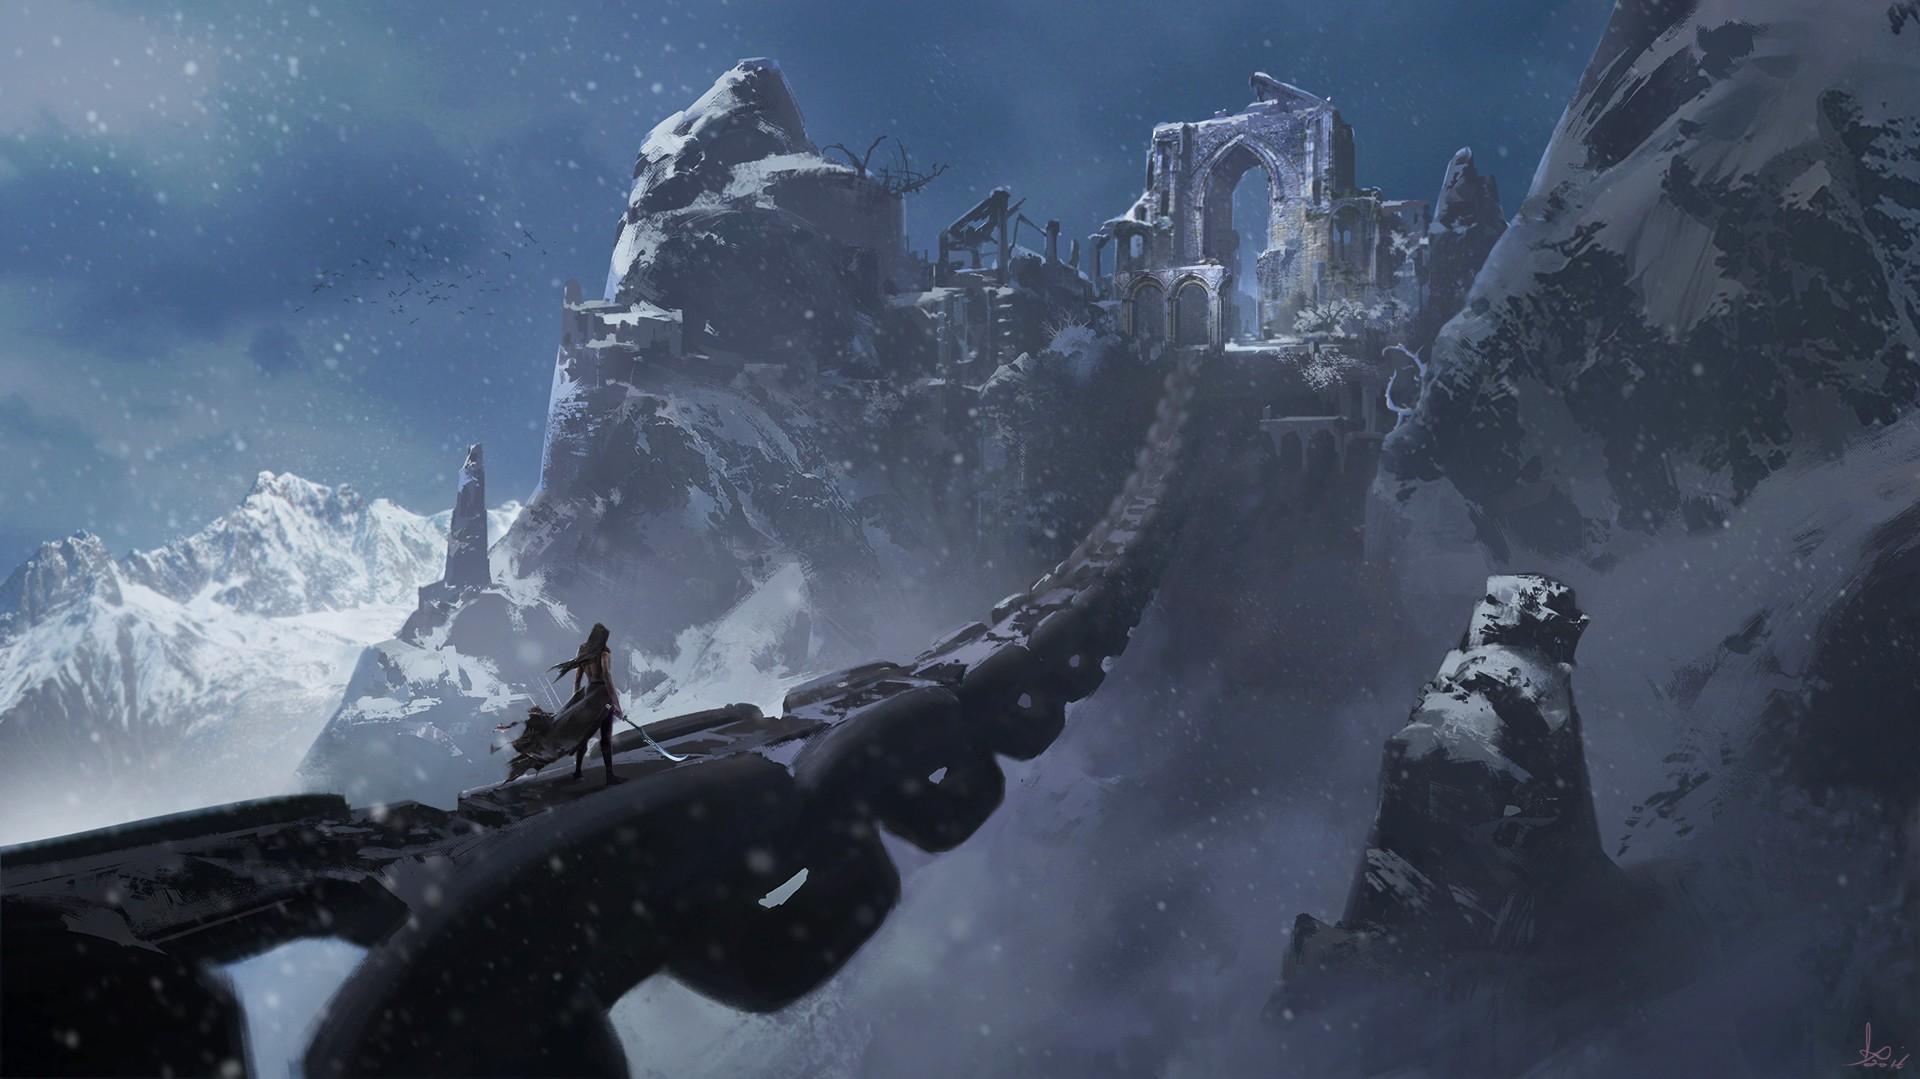 Wonderful Wallpaper Mountain Fantasy - mountains-fantasy-art-snow-sword-chains-Terrain-mountain-screenshot-computer-wallpaper-geological-phenomenon-mountain-range-extreme-sport-44237  Collection_88269.jpg